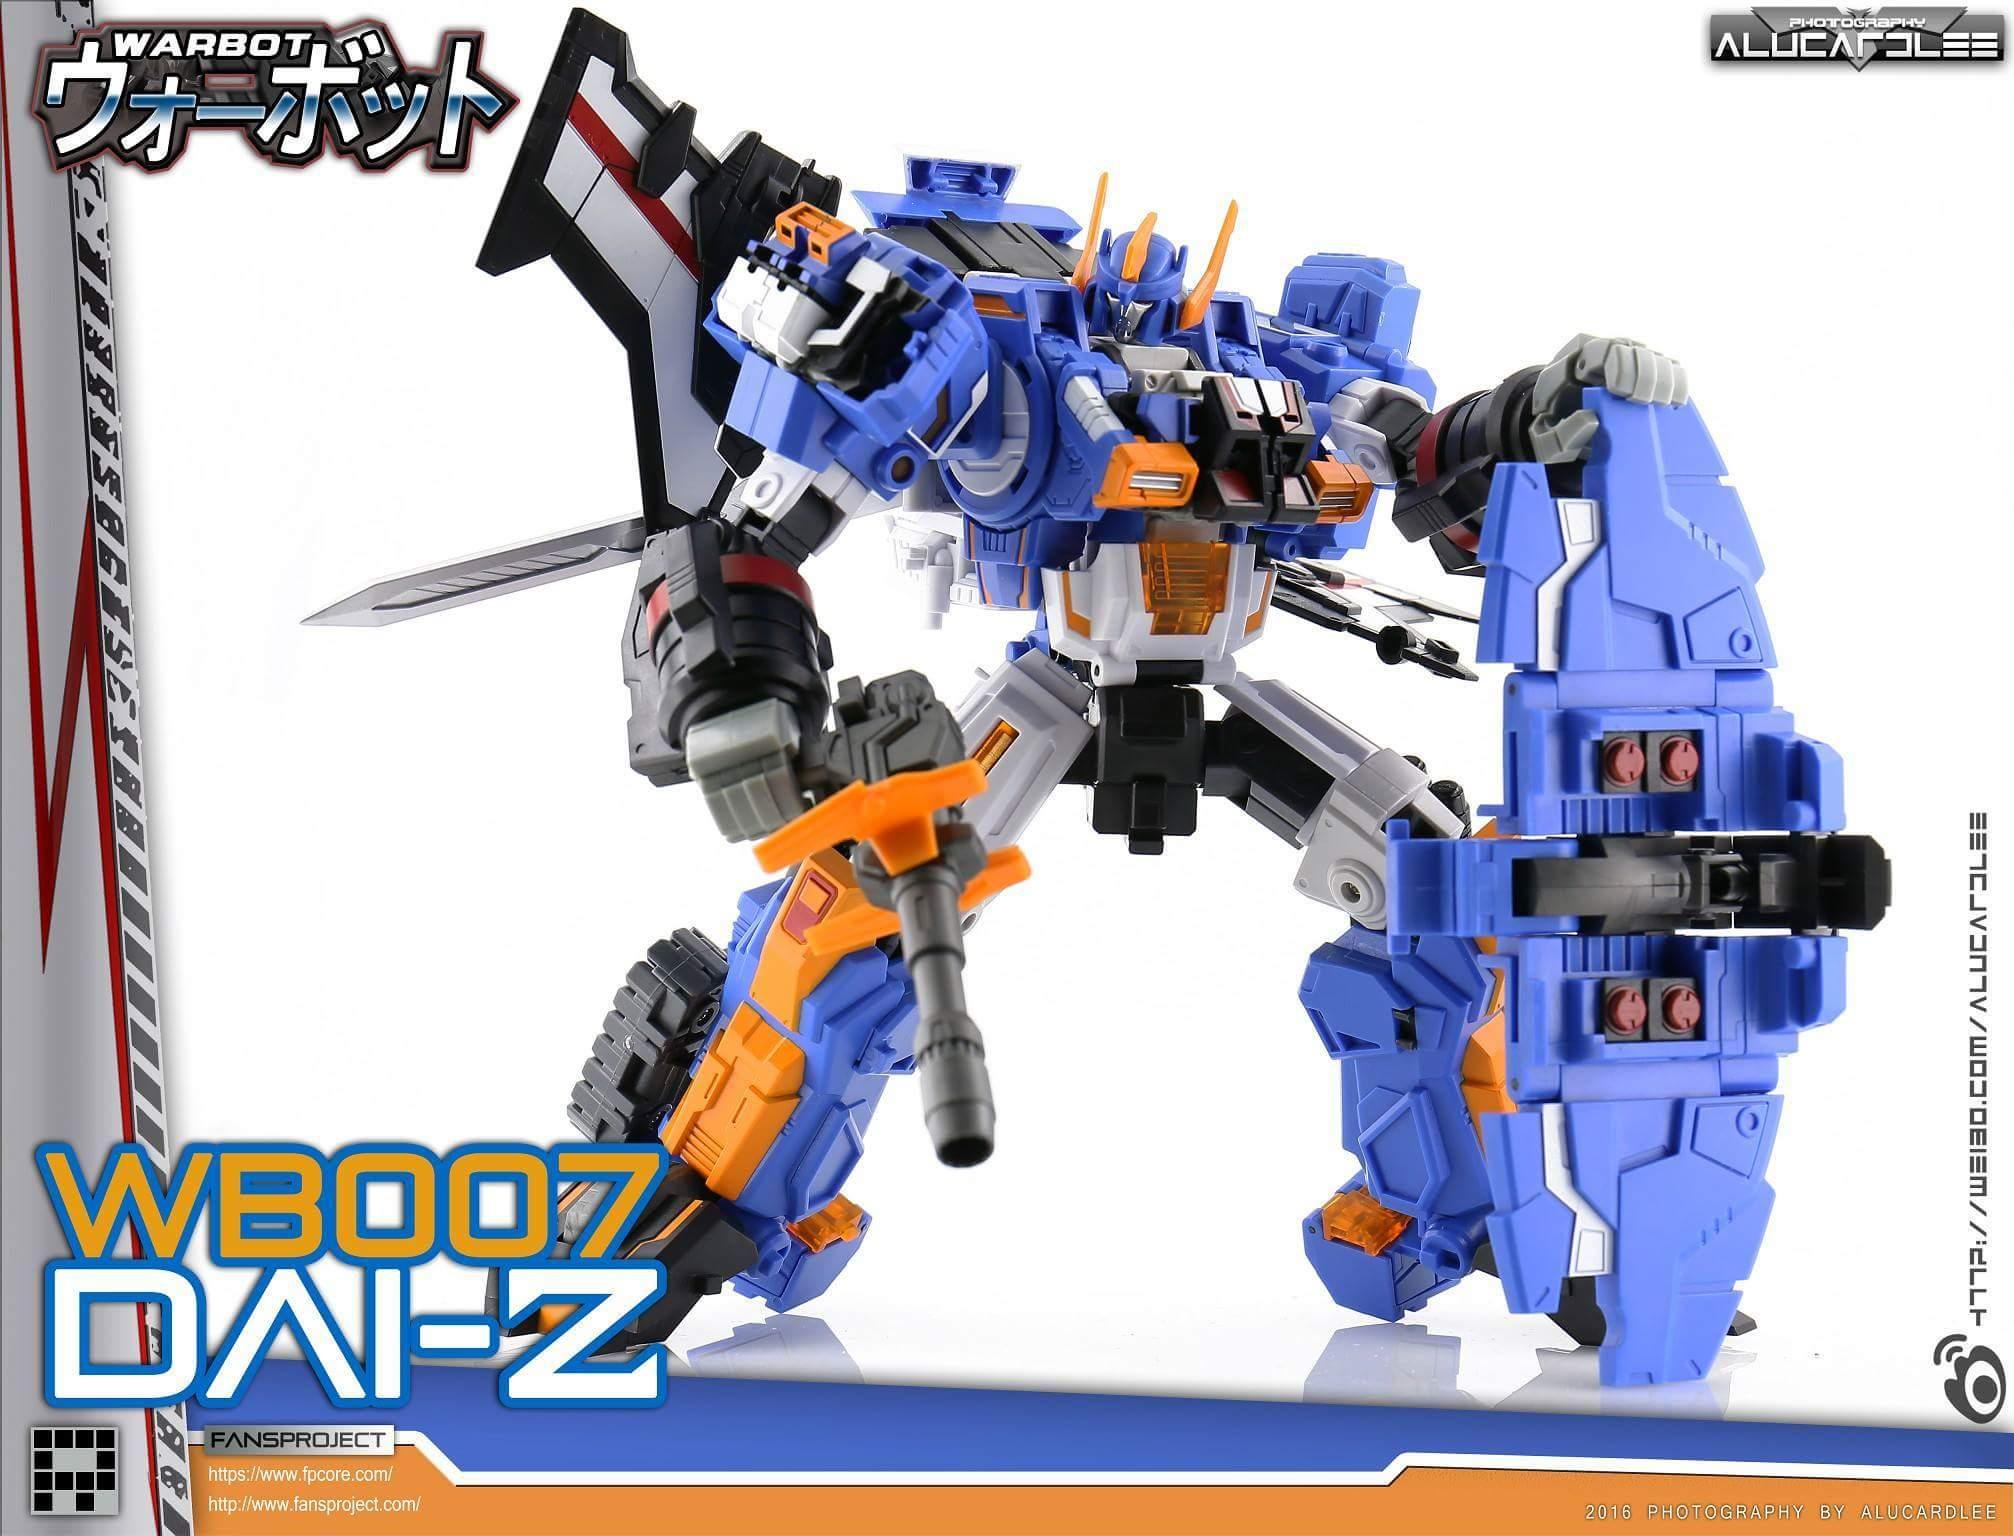 [Fansproject] Produit Tiers - Jouet WB-007 Dai-Z - aka Dai Atlas (Transformers Zone) L12Ye4IX